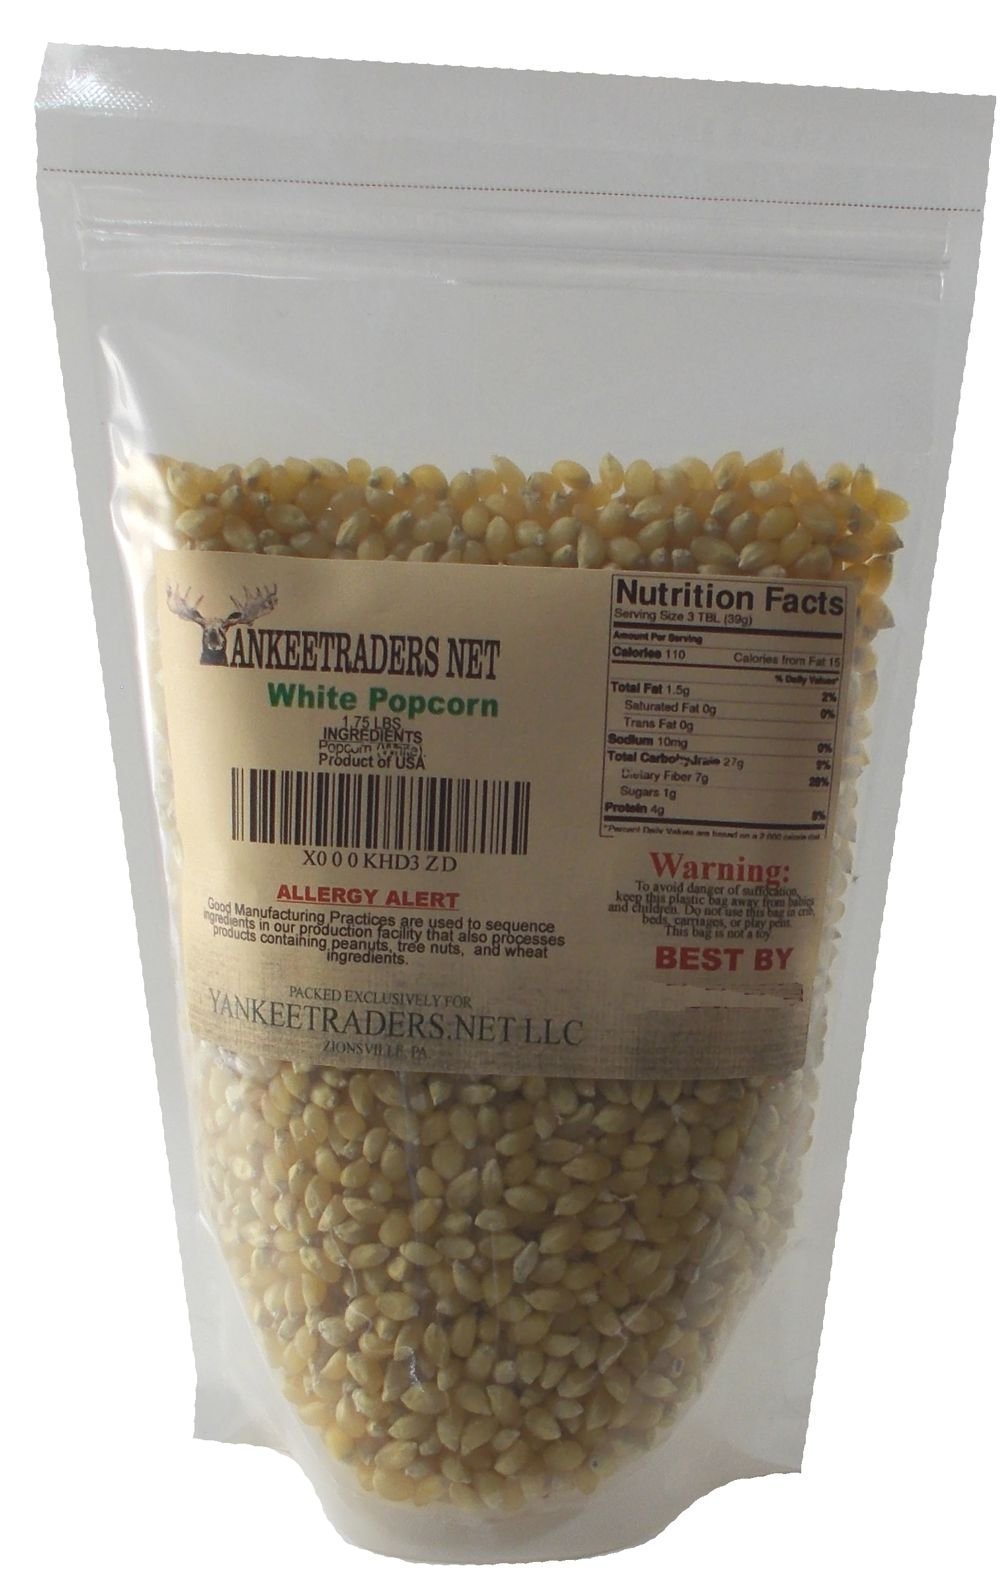 White Popcorn, 1 3/4 Lb Pack, Yankee Traders Brand